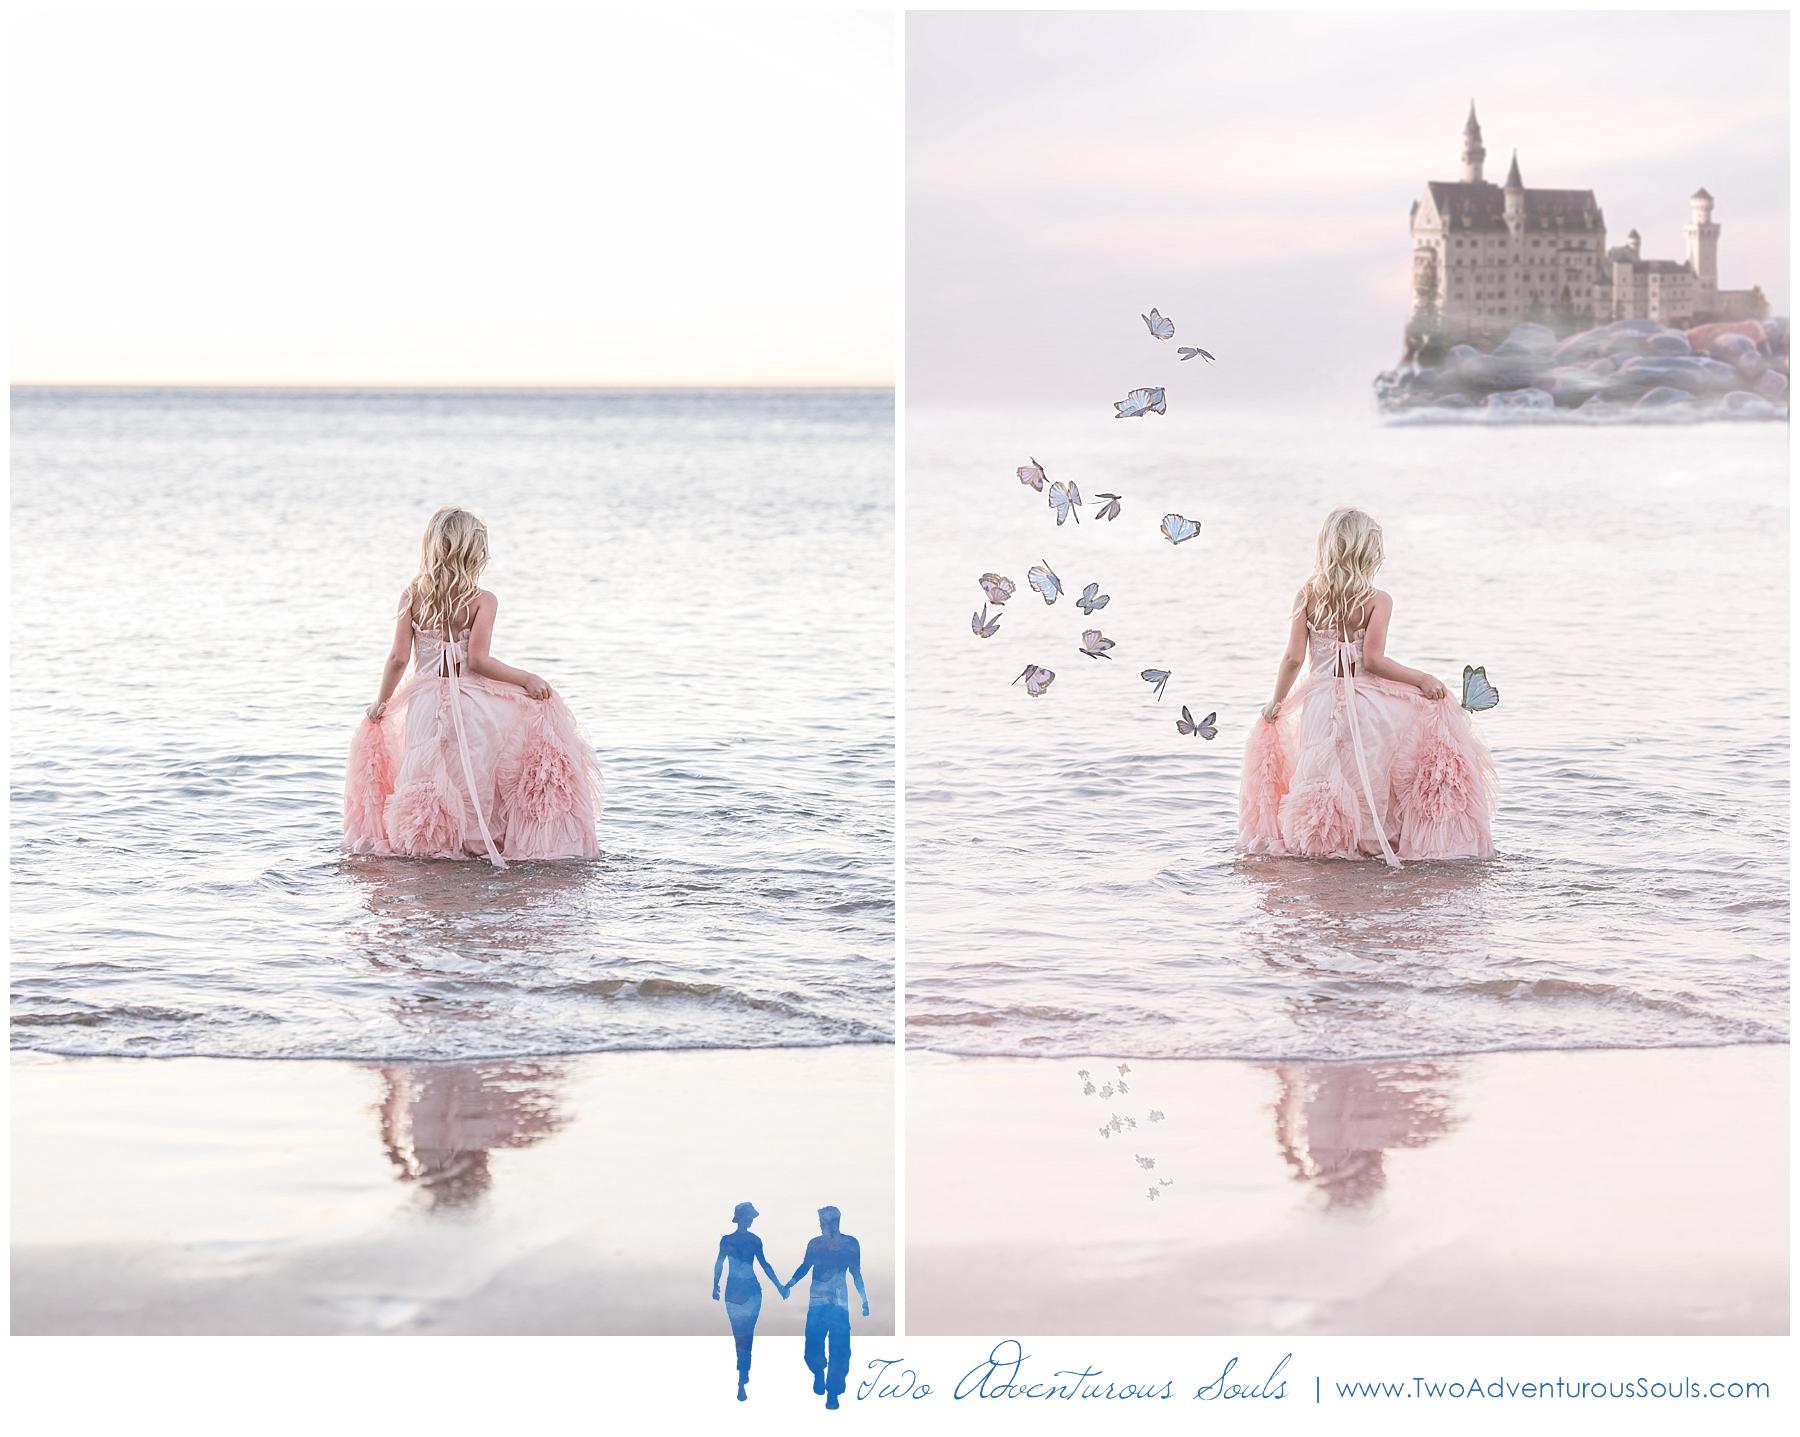 Dreams Las Mareas Wedding, Costa Rica Wedding Photographers - Two Adventurous Souls_Costa Rica Fine Art Photographers